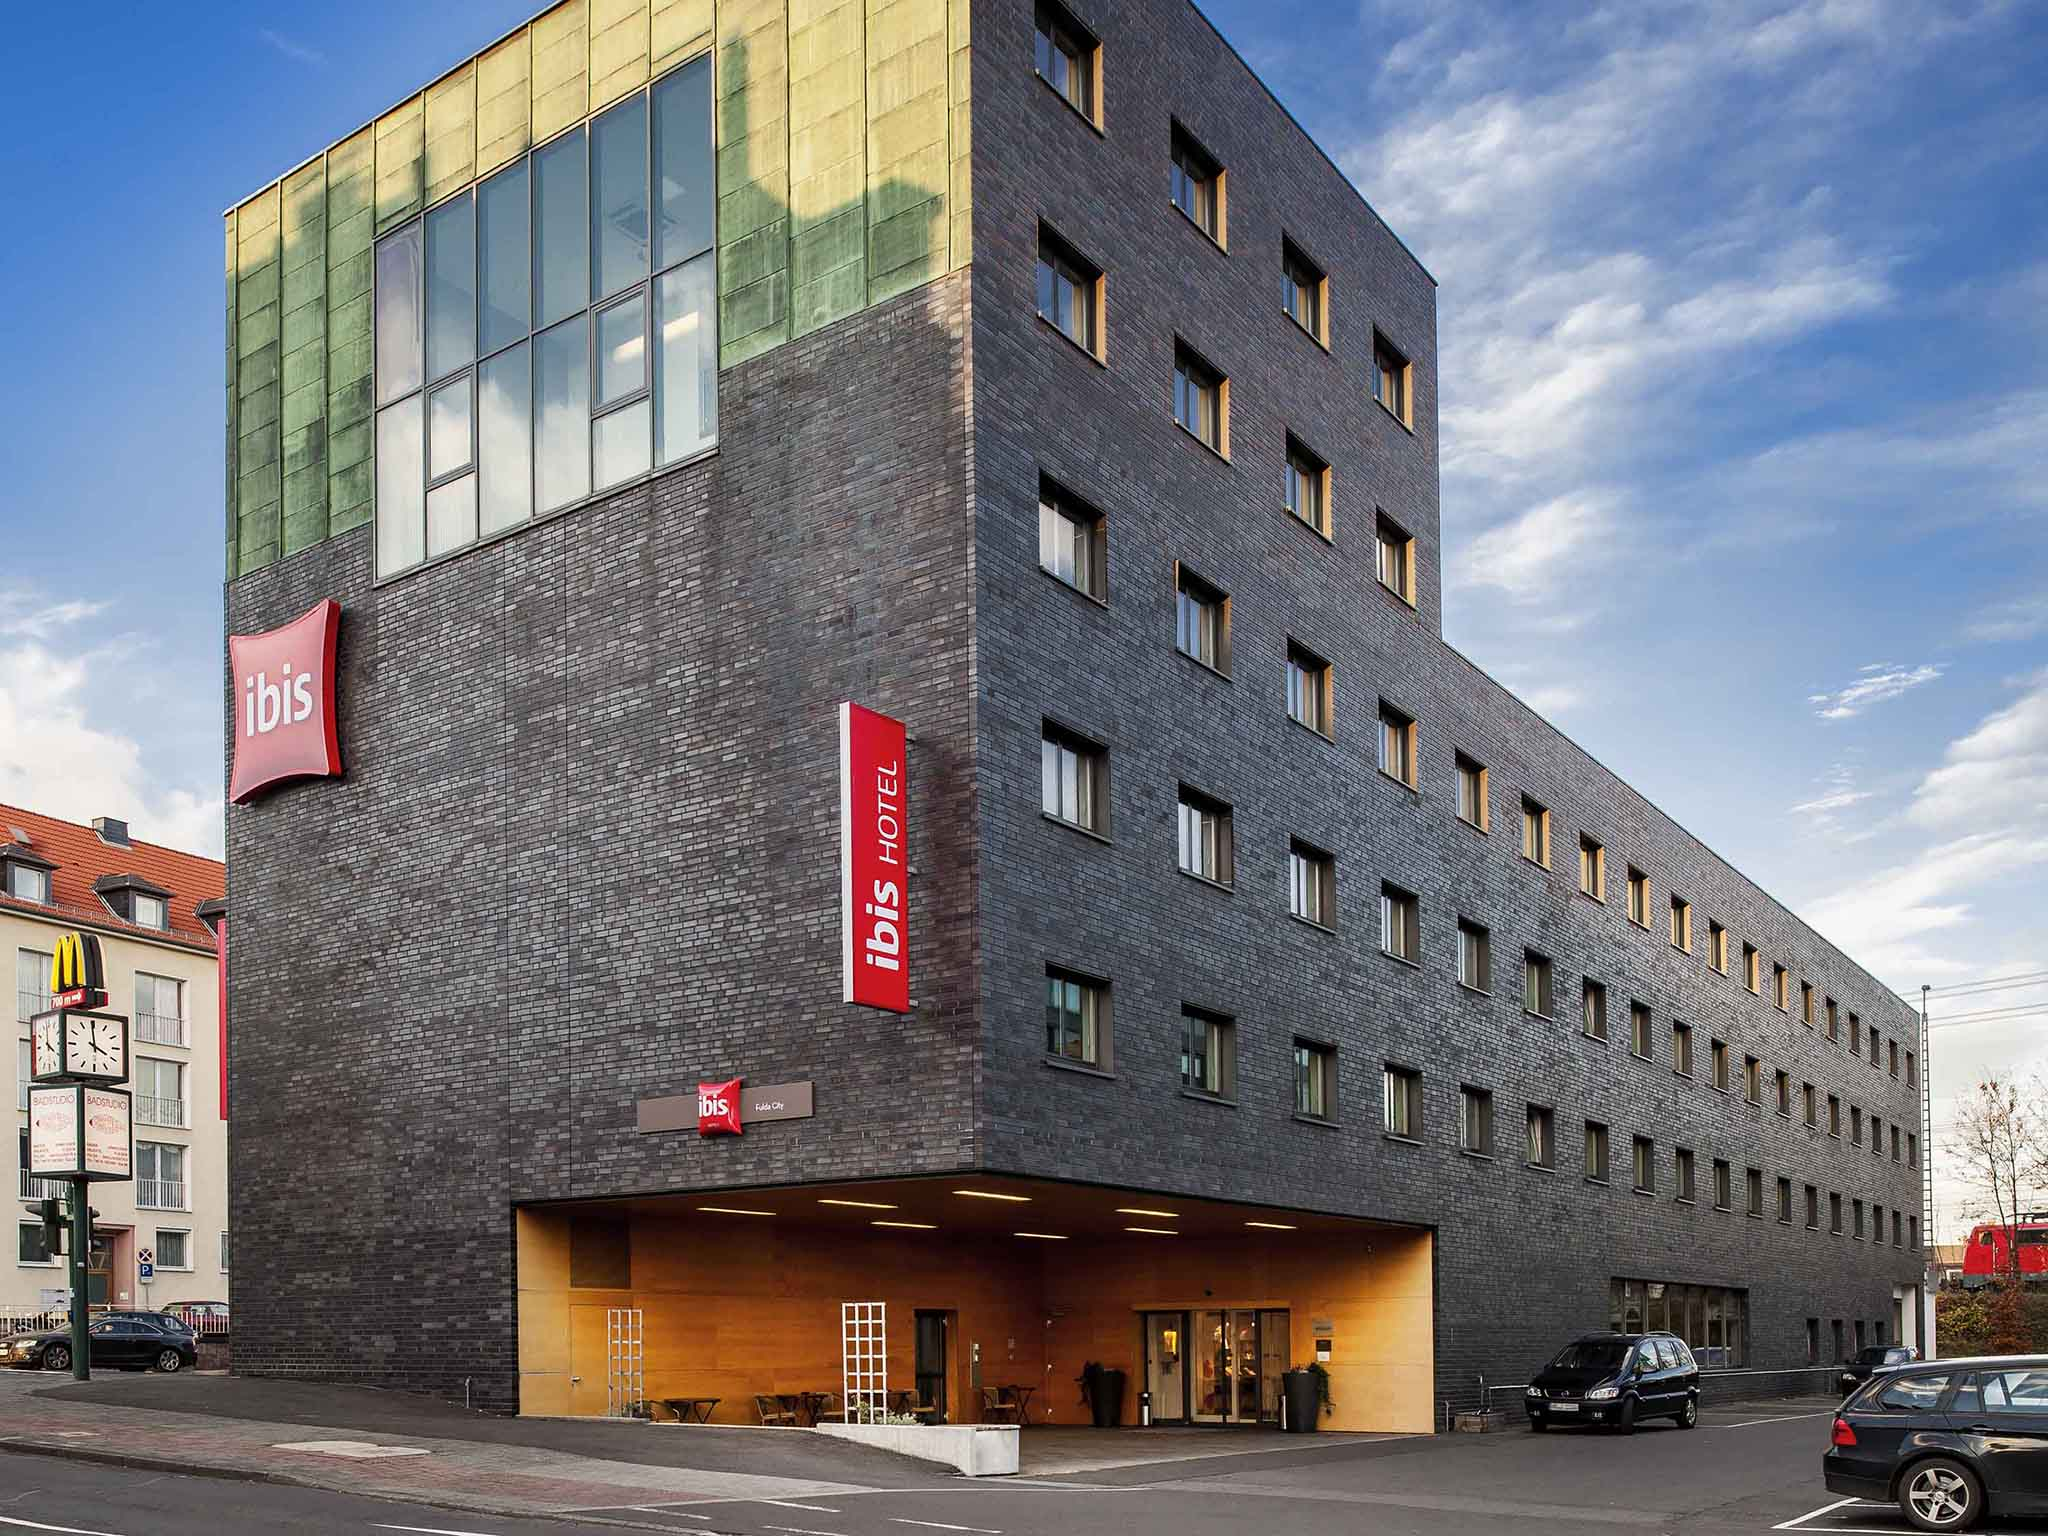 Hotel in fulda ibis hotel fulda city online buchen for Designhotel fulda